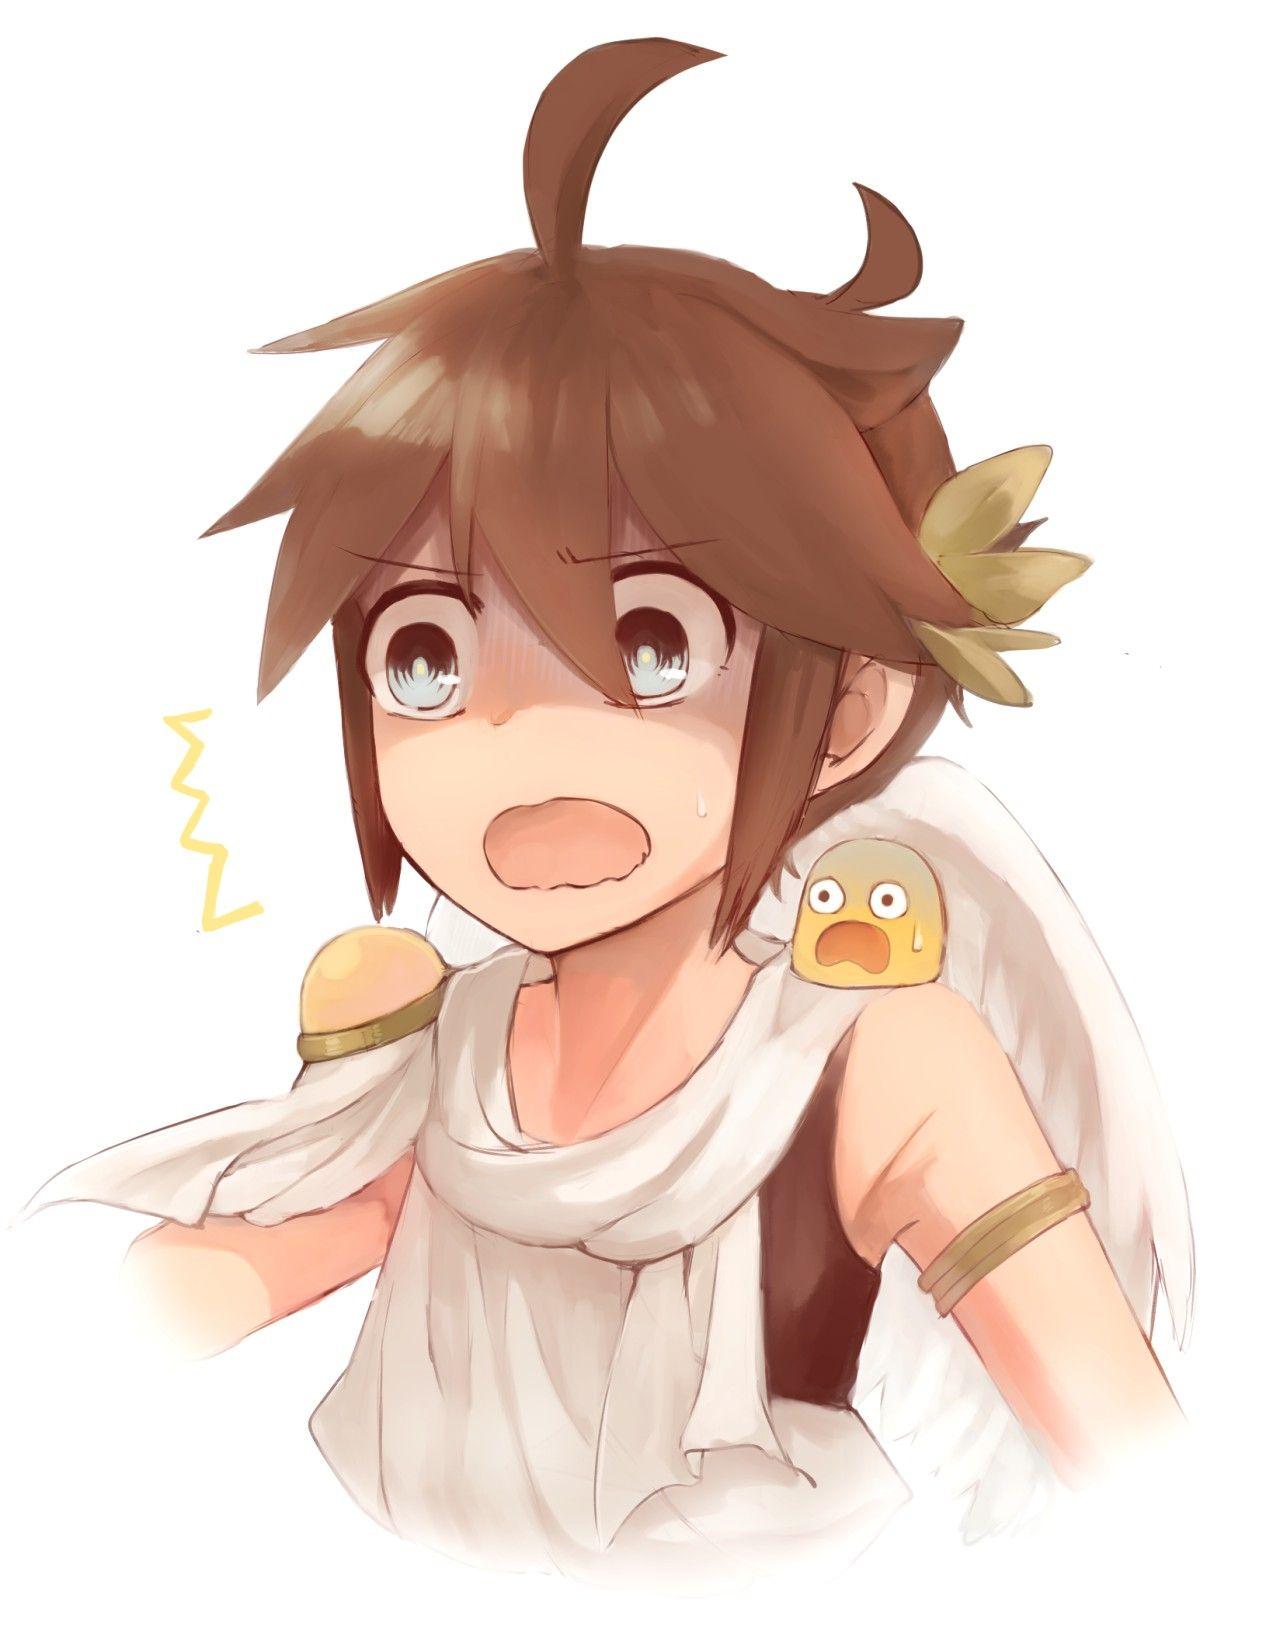 Kid Icarus Uprising image by ꧁ঔৣ ᗰOOᑎᒪIᘜᕼT ঔৣ꧂ Kid